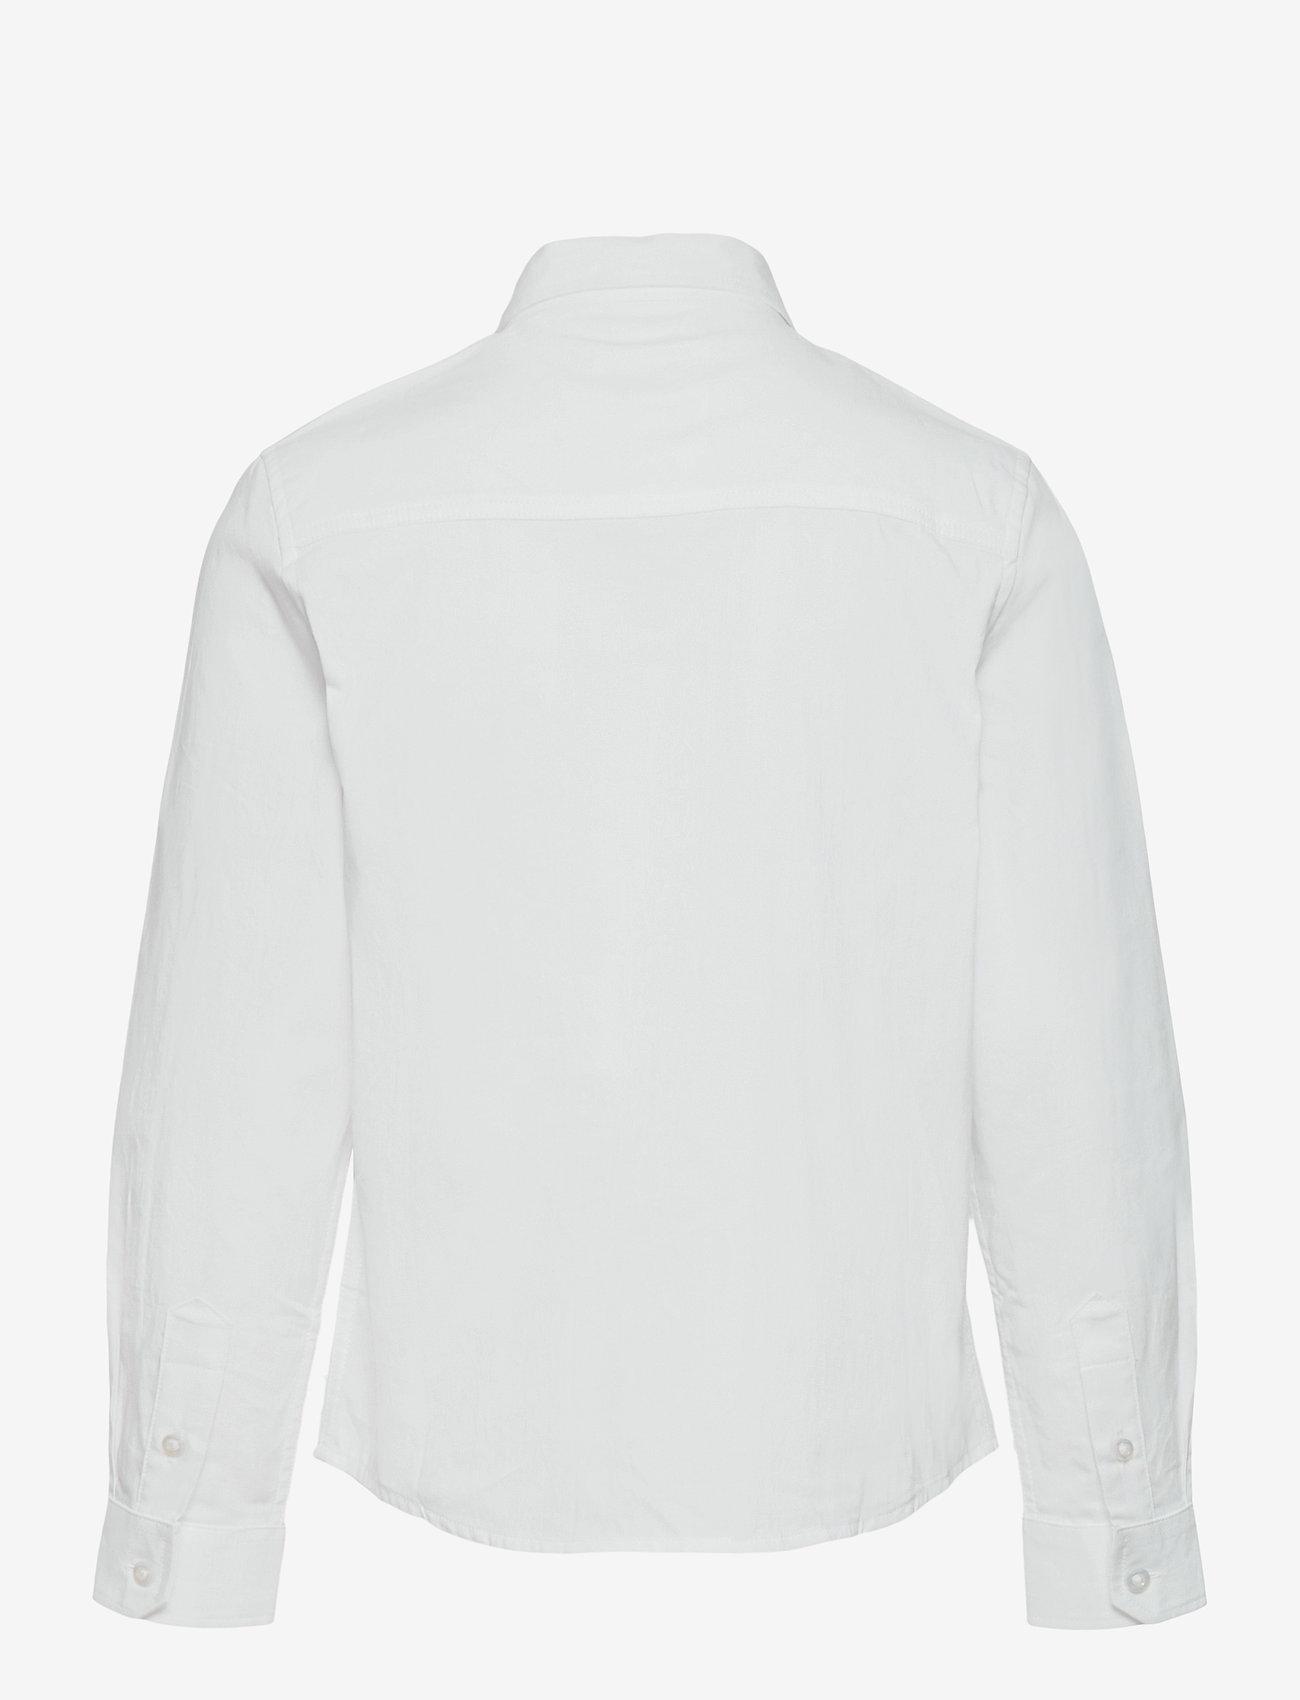 BOSS - SHIRT - shirts - white - 1